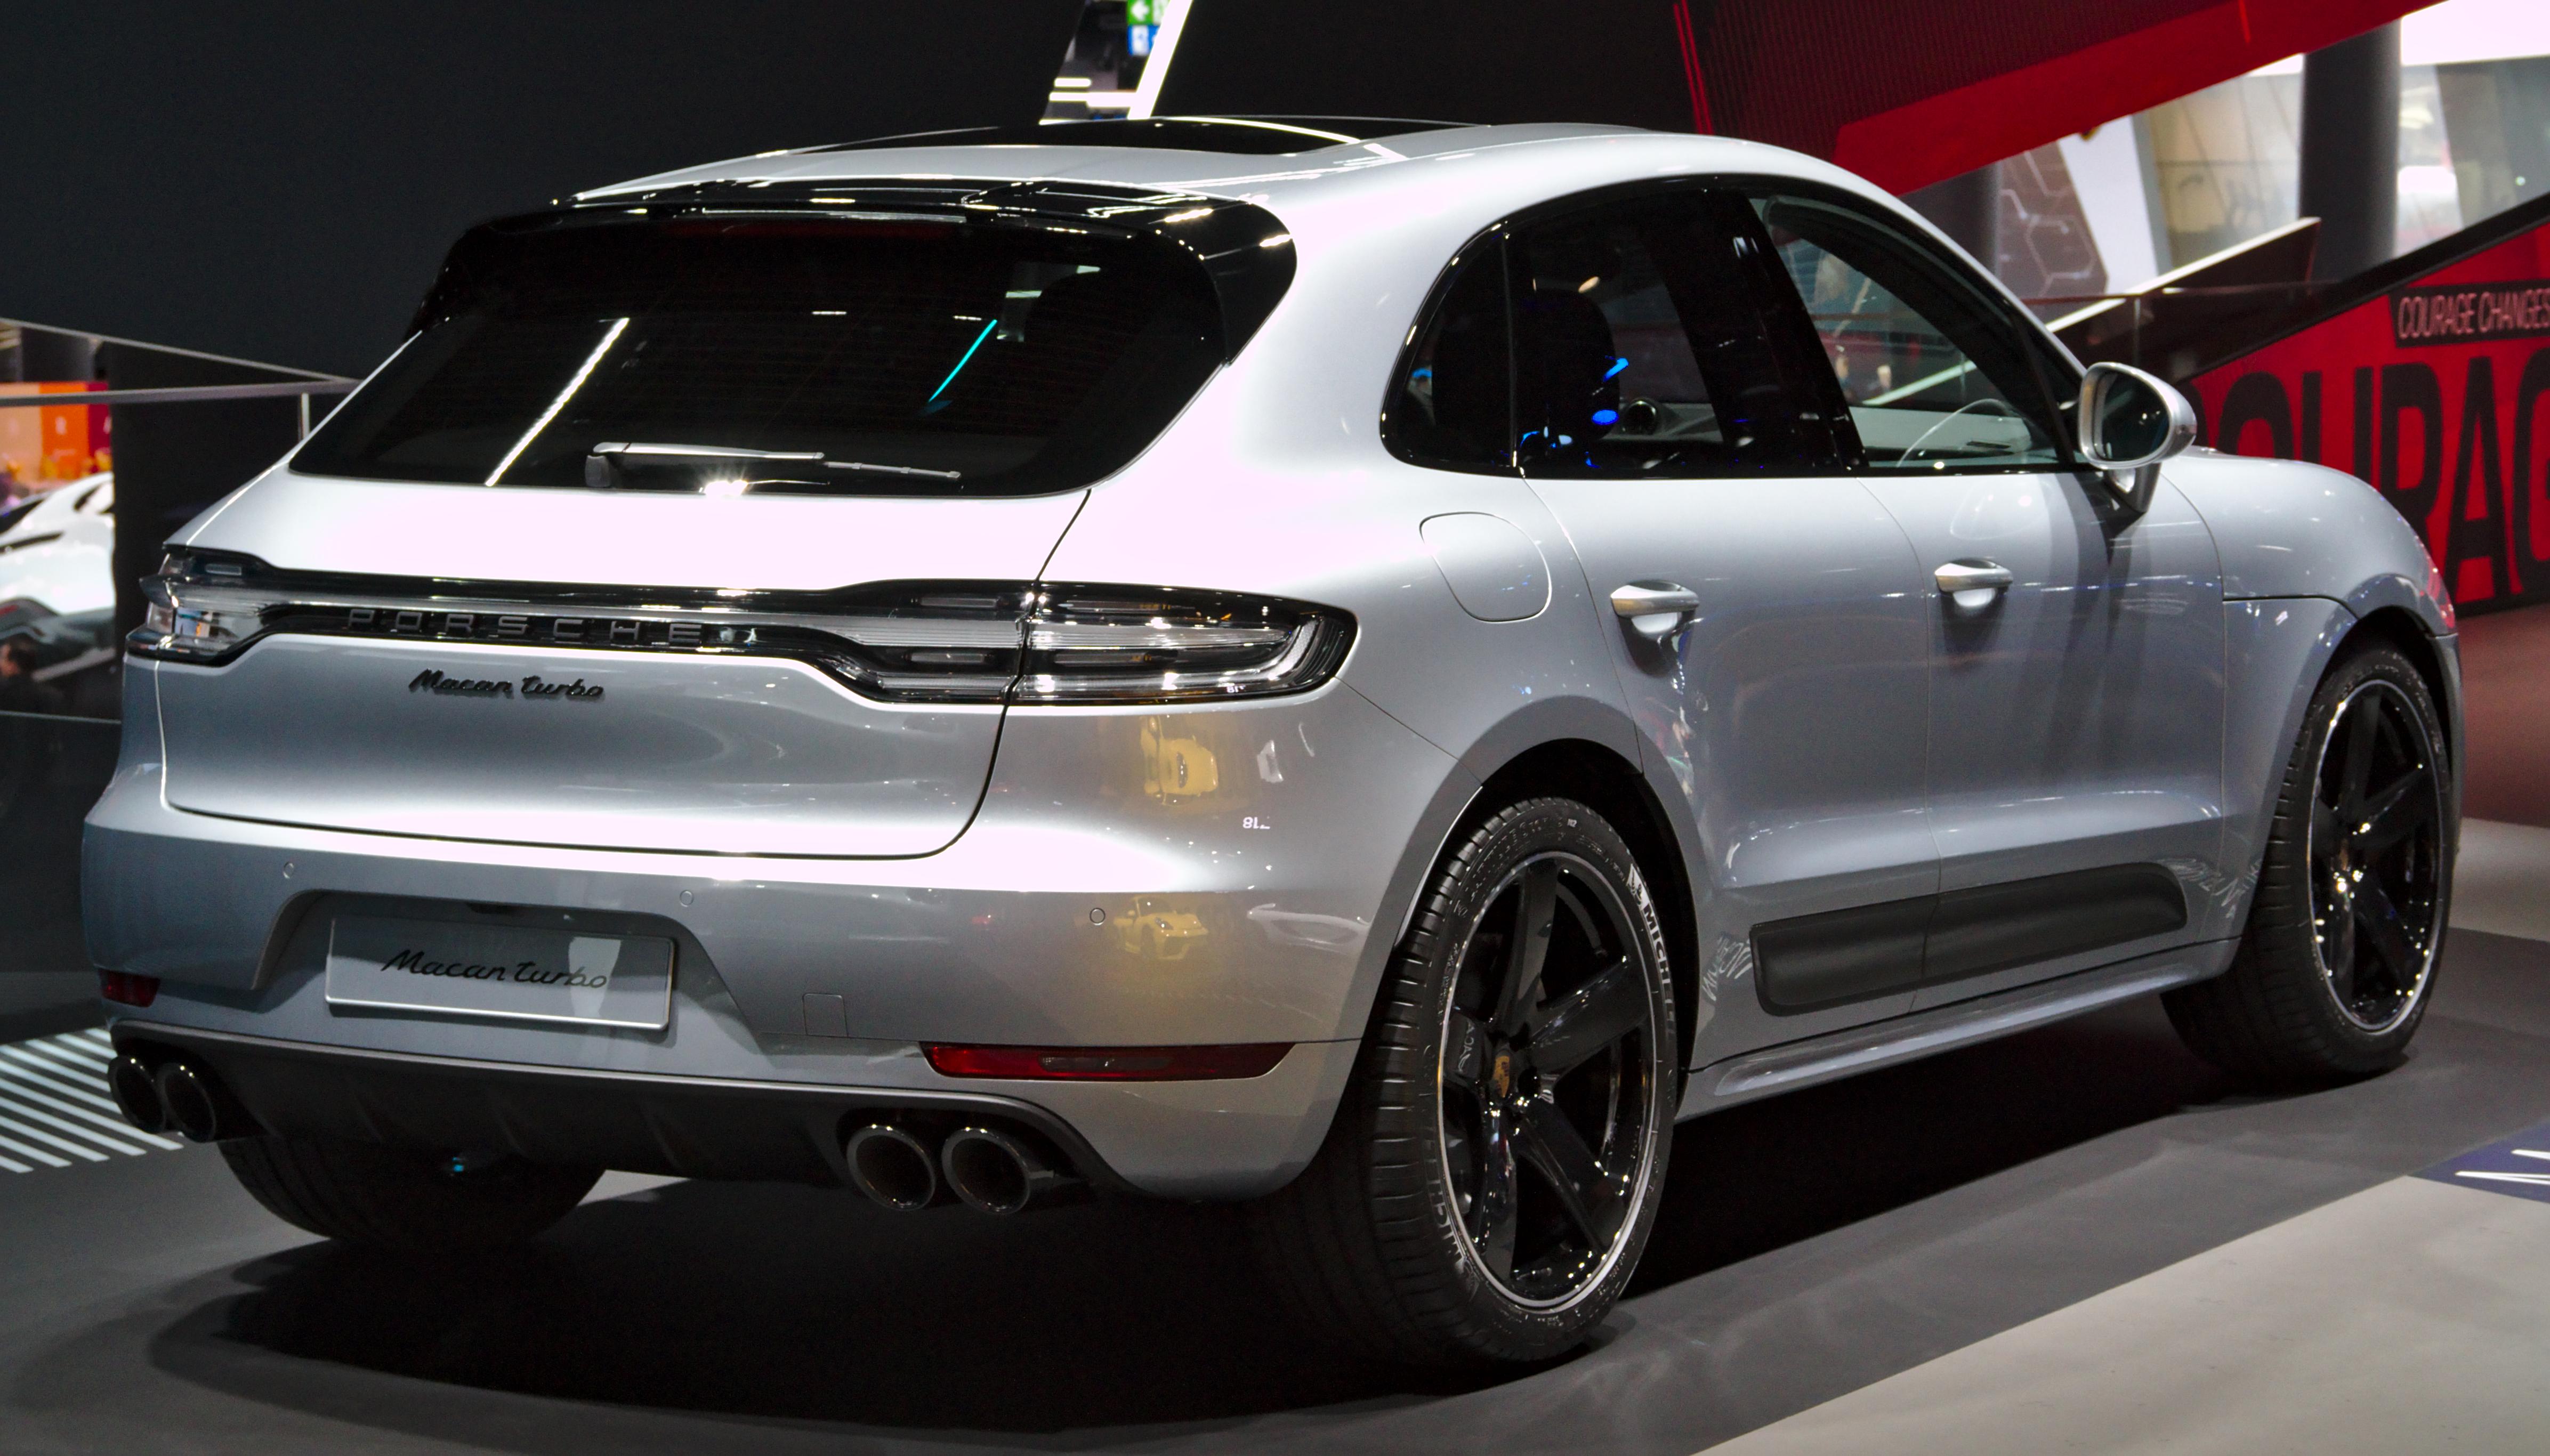 Porsche Macan Turbo >> File Porsche Macan Turbo At Iaa 2019 Img 0259 Jpg